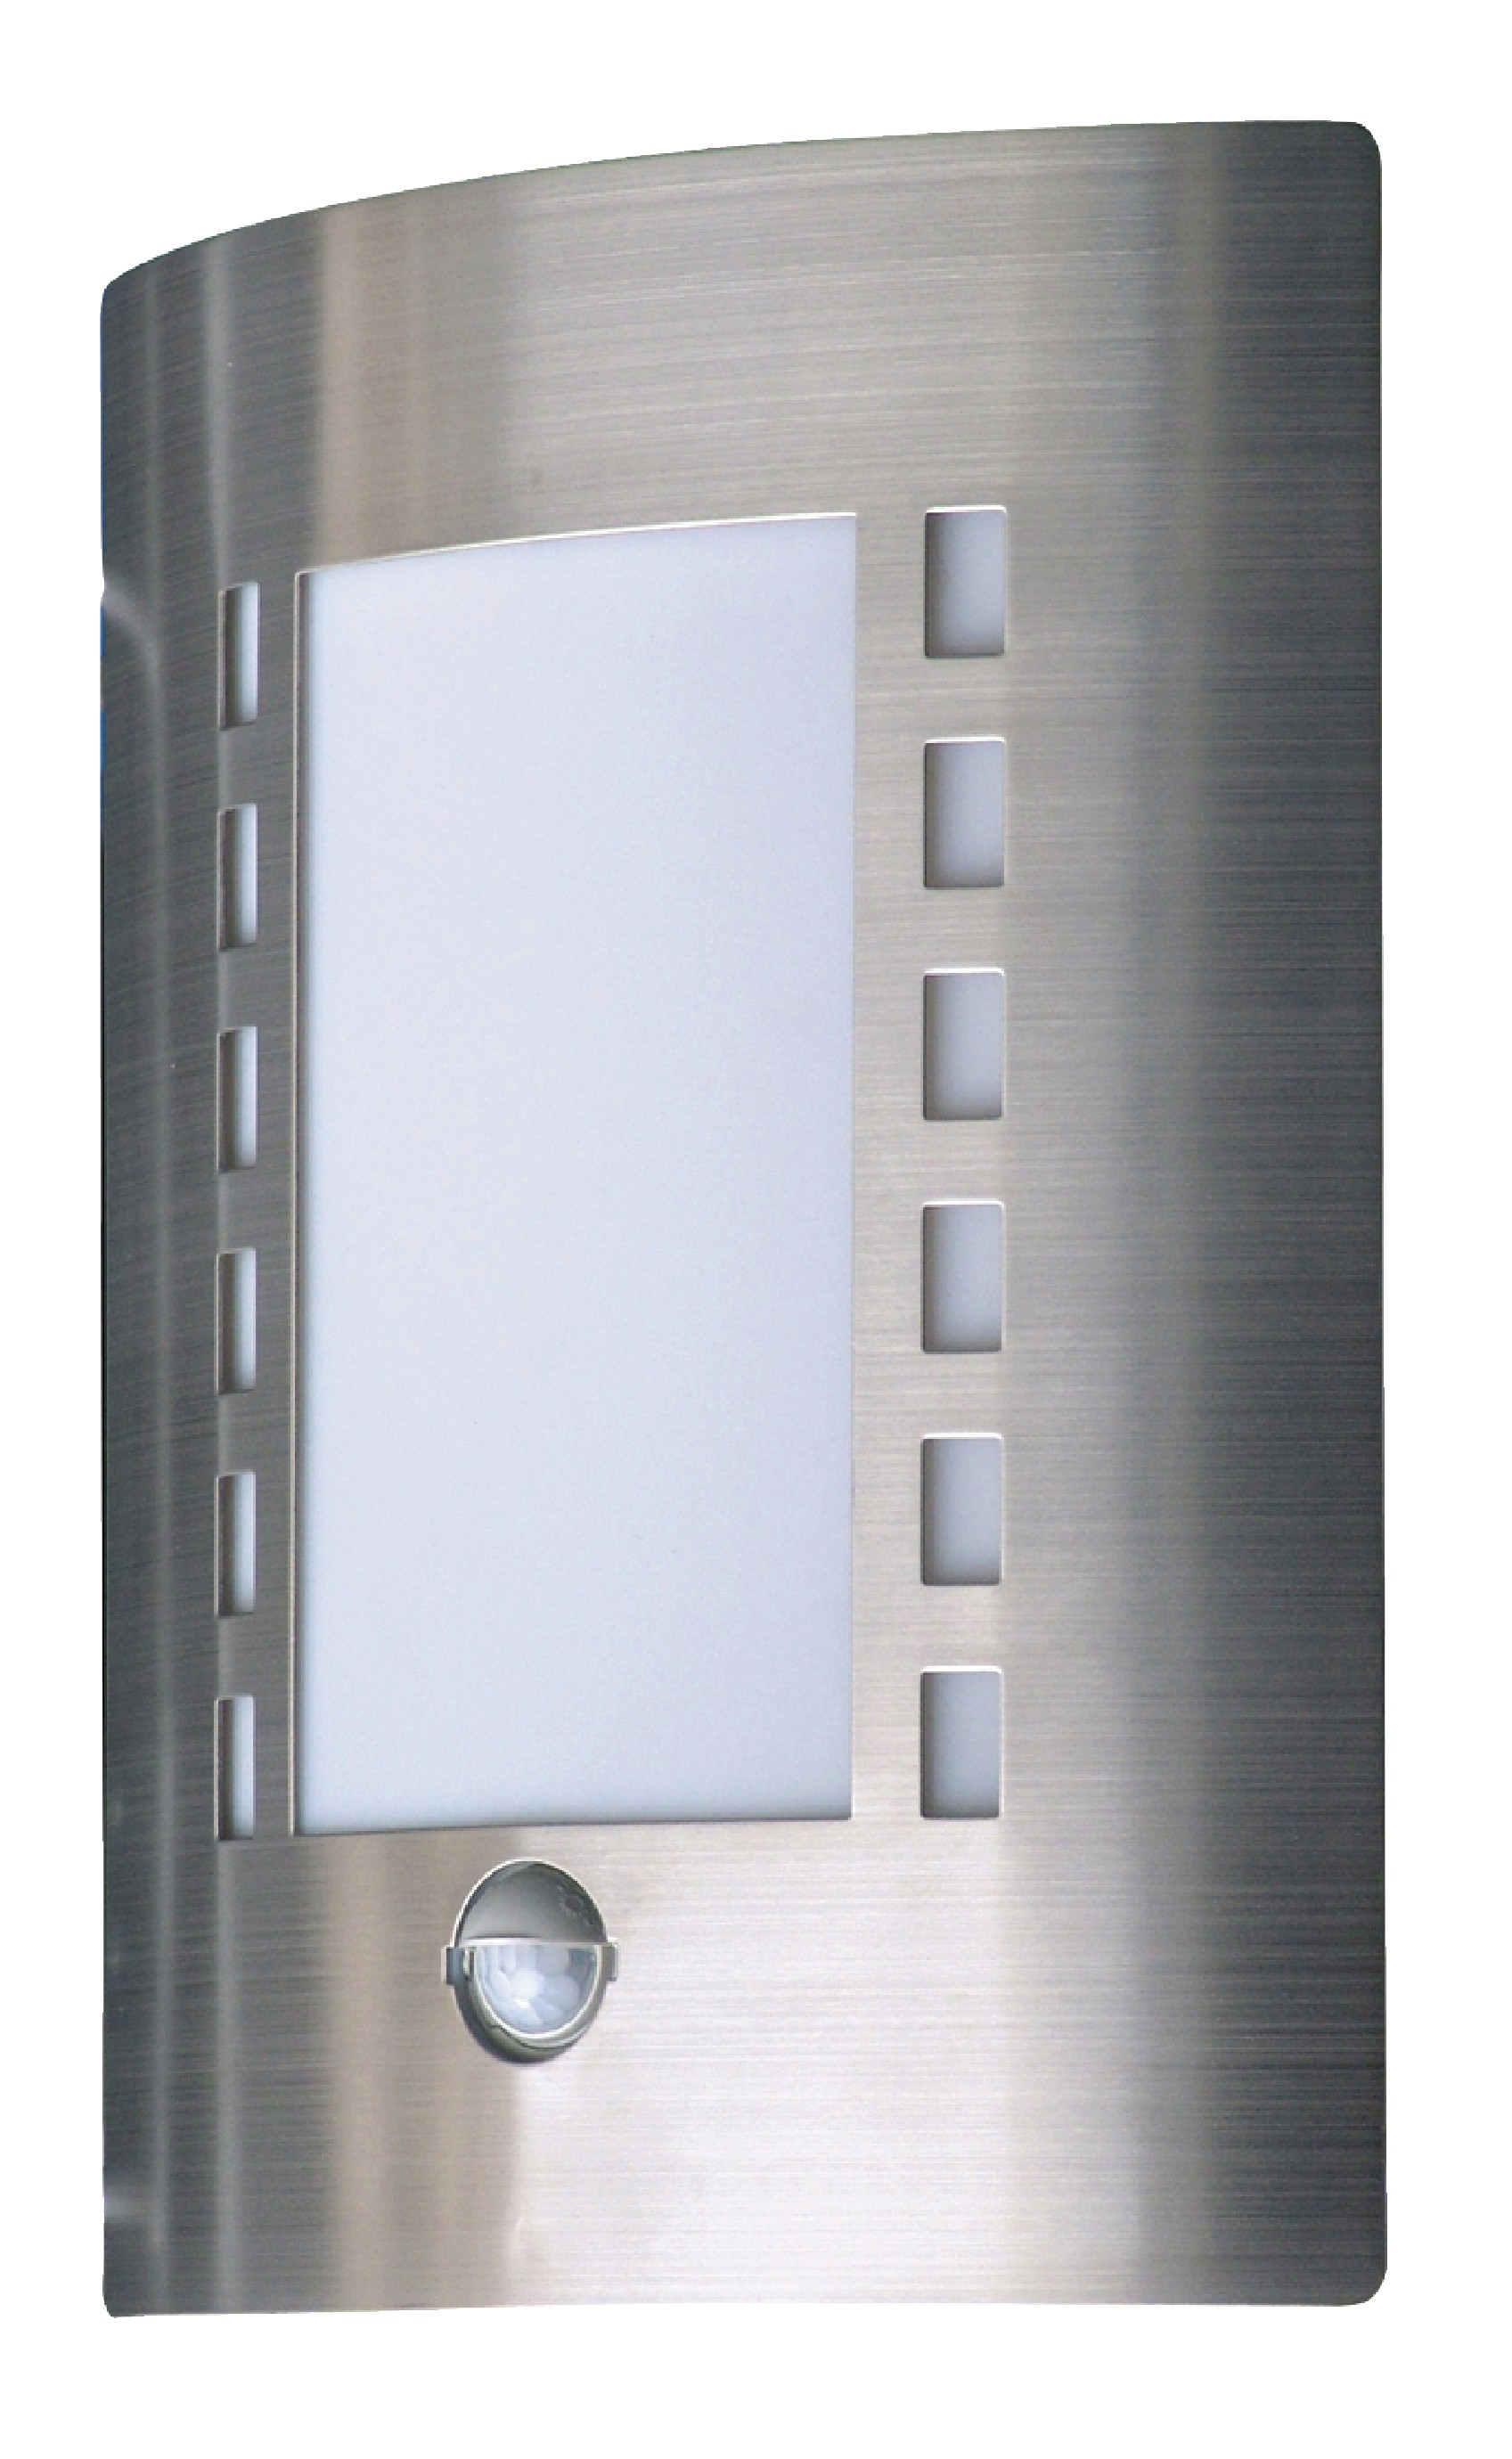 Venkovní nástěnné svítidlo E27 PIR Ranex RA-OUTDOOR4